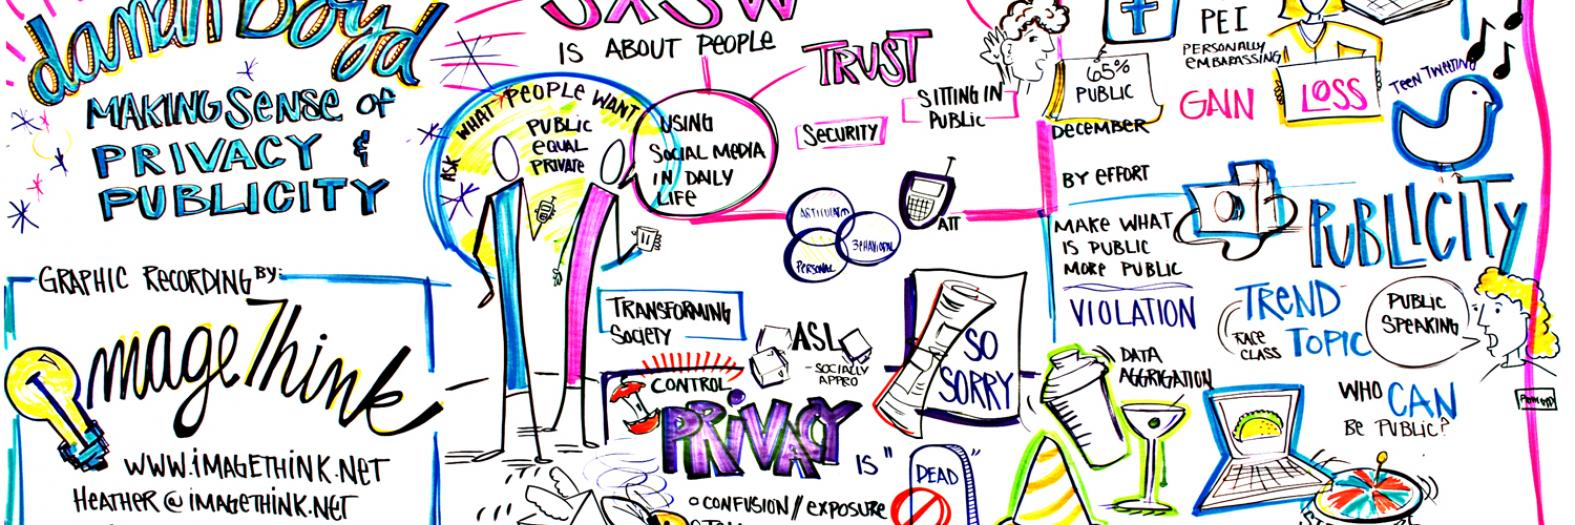 "danah boyd's 2010 SXSW Interactive keynote. (Drawing by <a href=""http://www.imagethink.net"">ImageThink</a>.)"